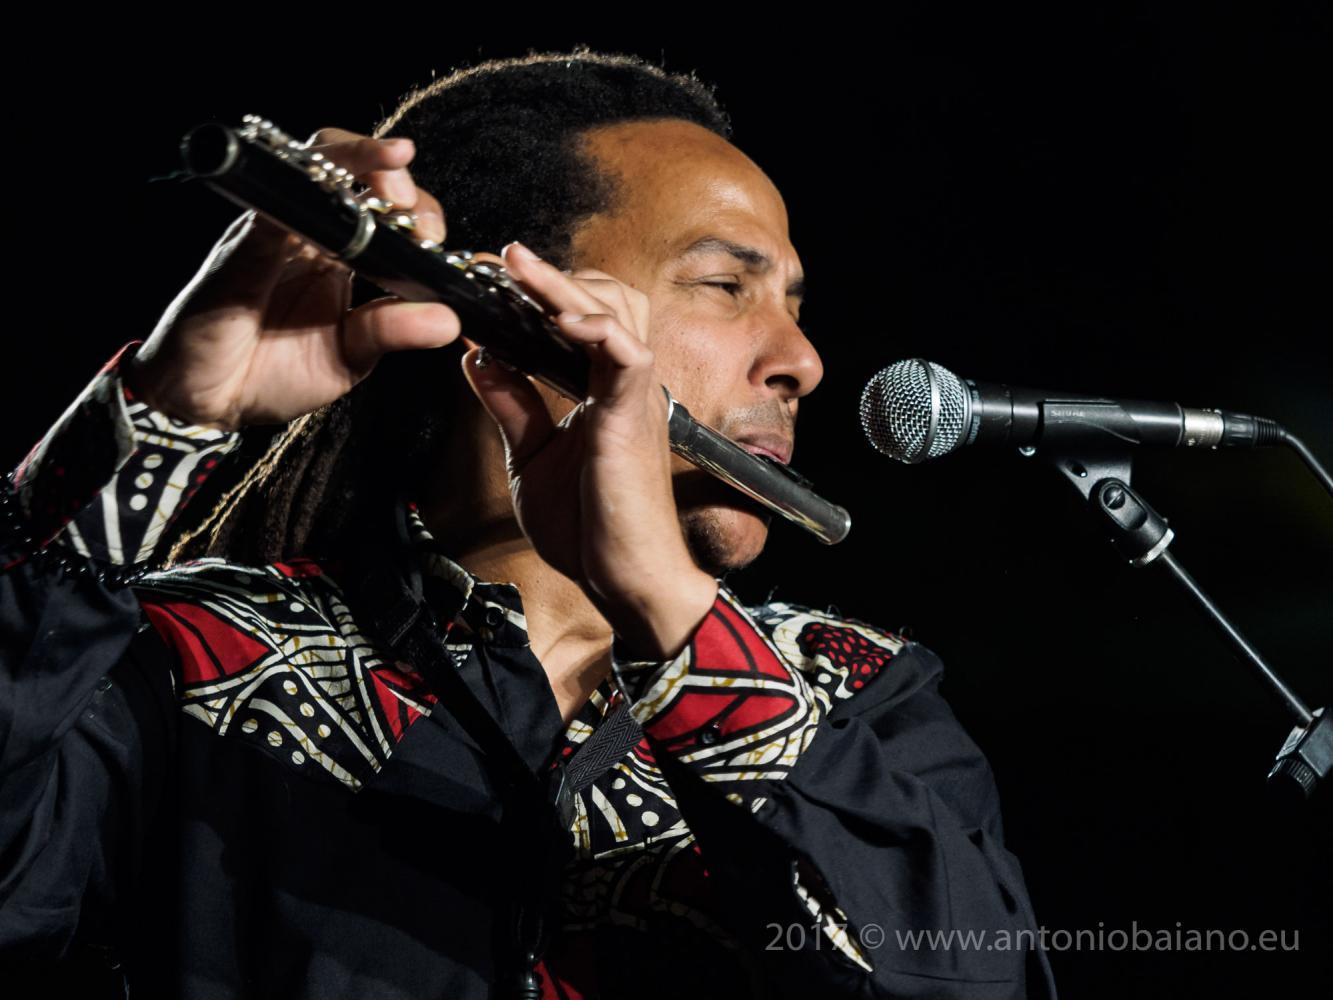 Leandro Saint-Hill - Omar Sosa Quarteto AfroCubano